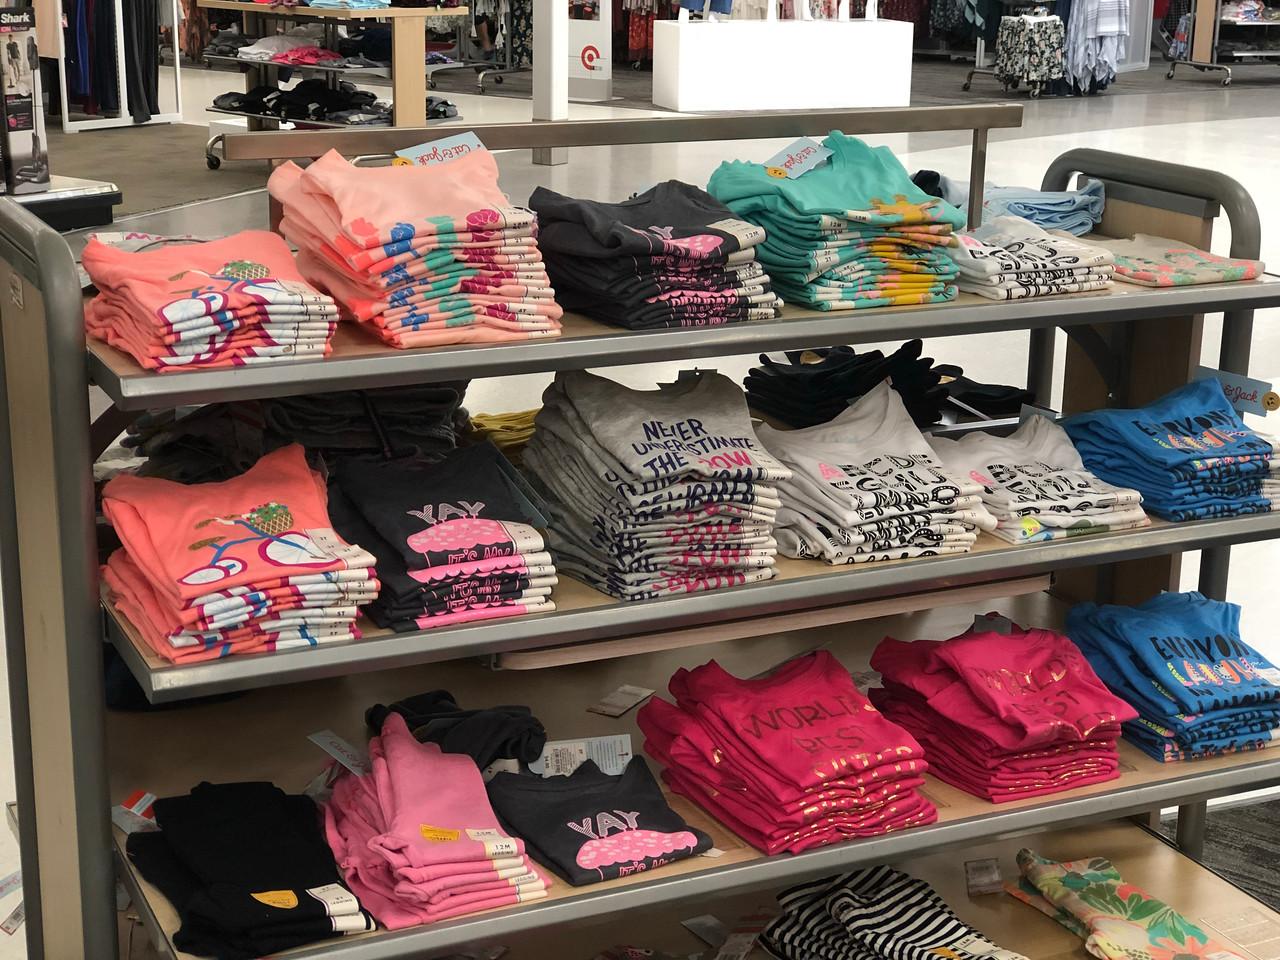 best target black friday 2018 deals – t-shirts